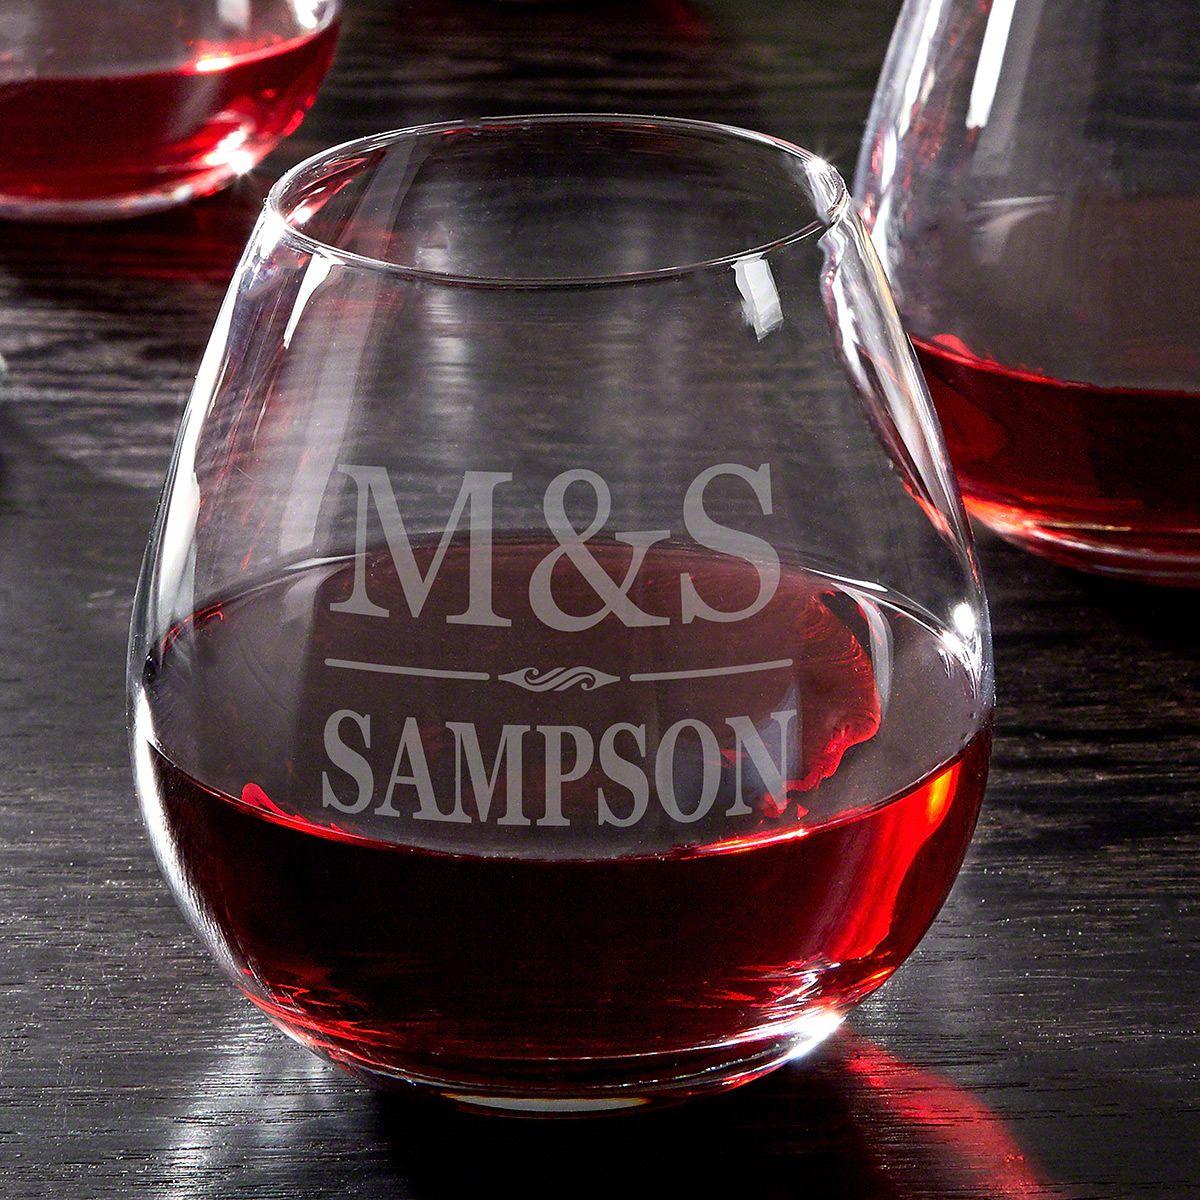 Brighton Engraved Stemless Red Wine Glass